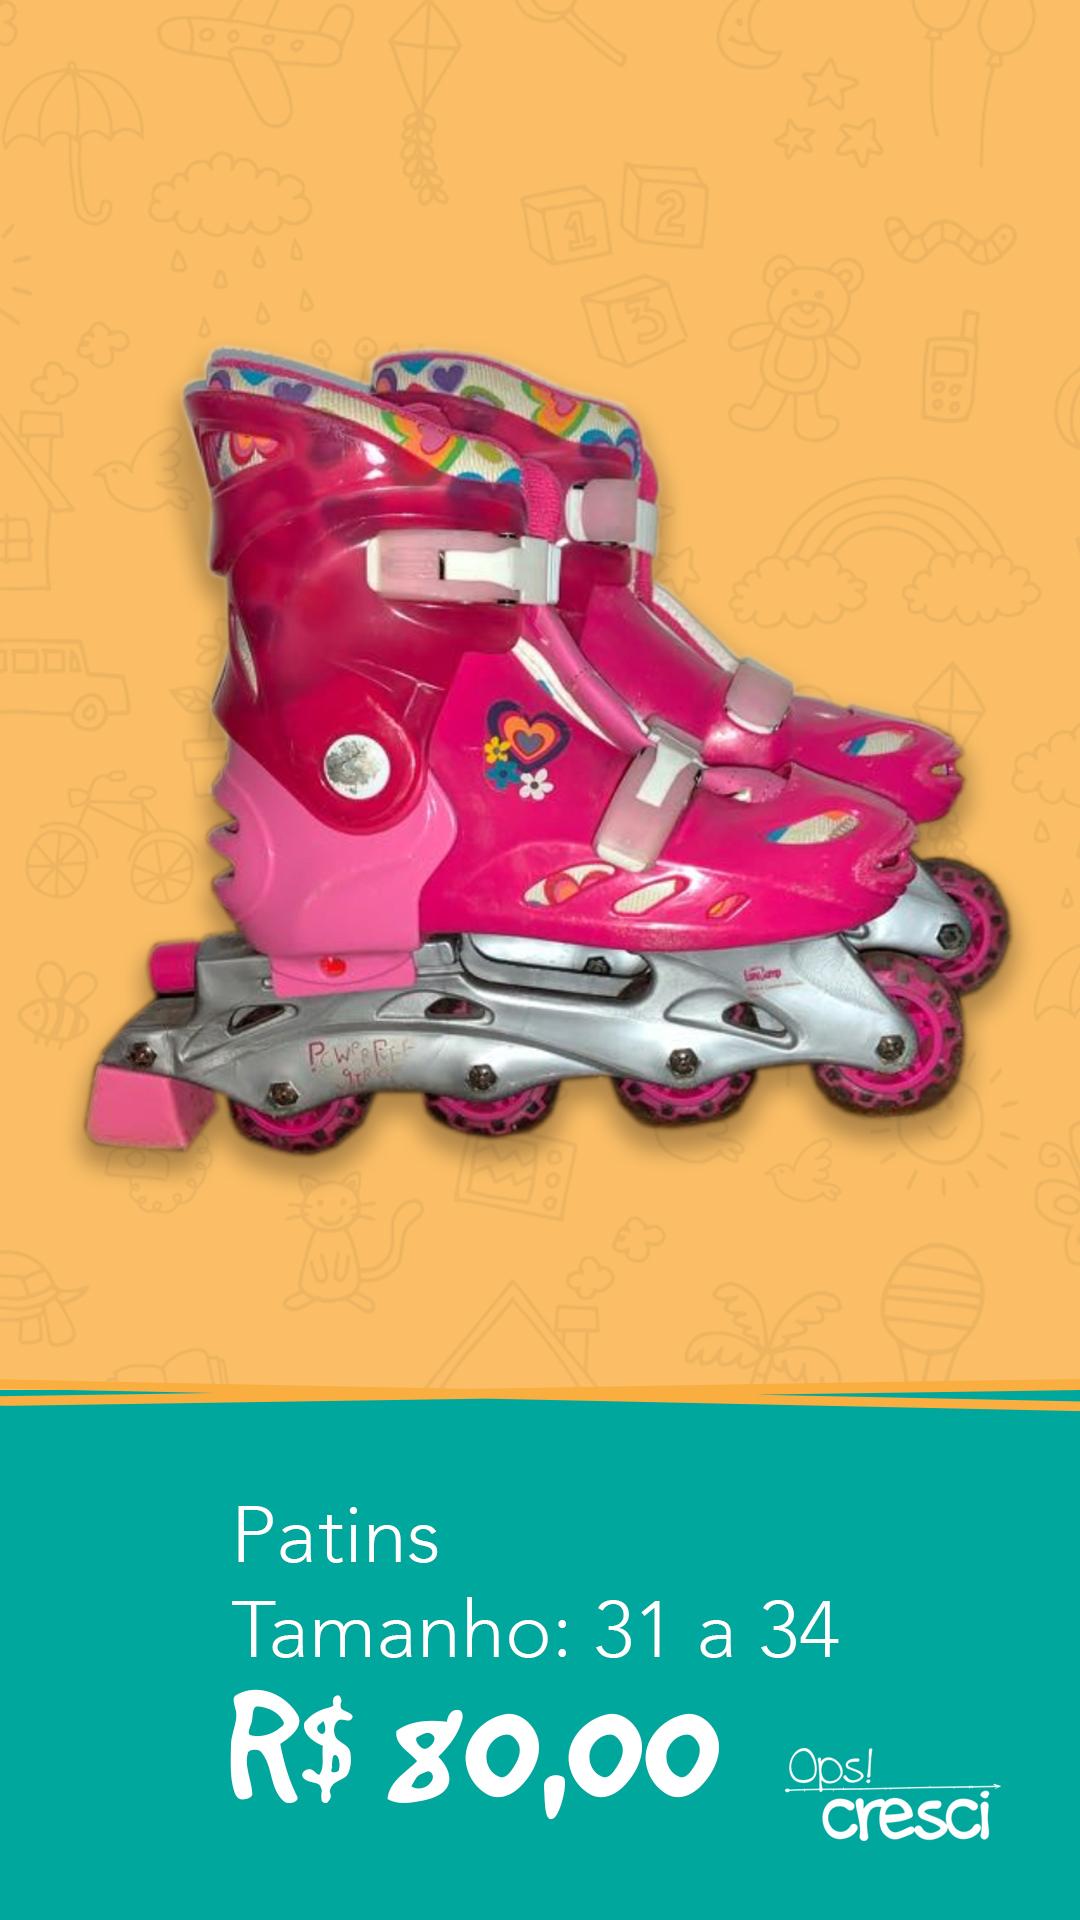 Stories - Brinquedos - 11